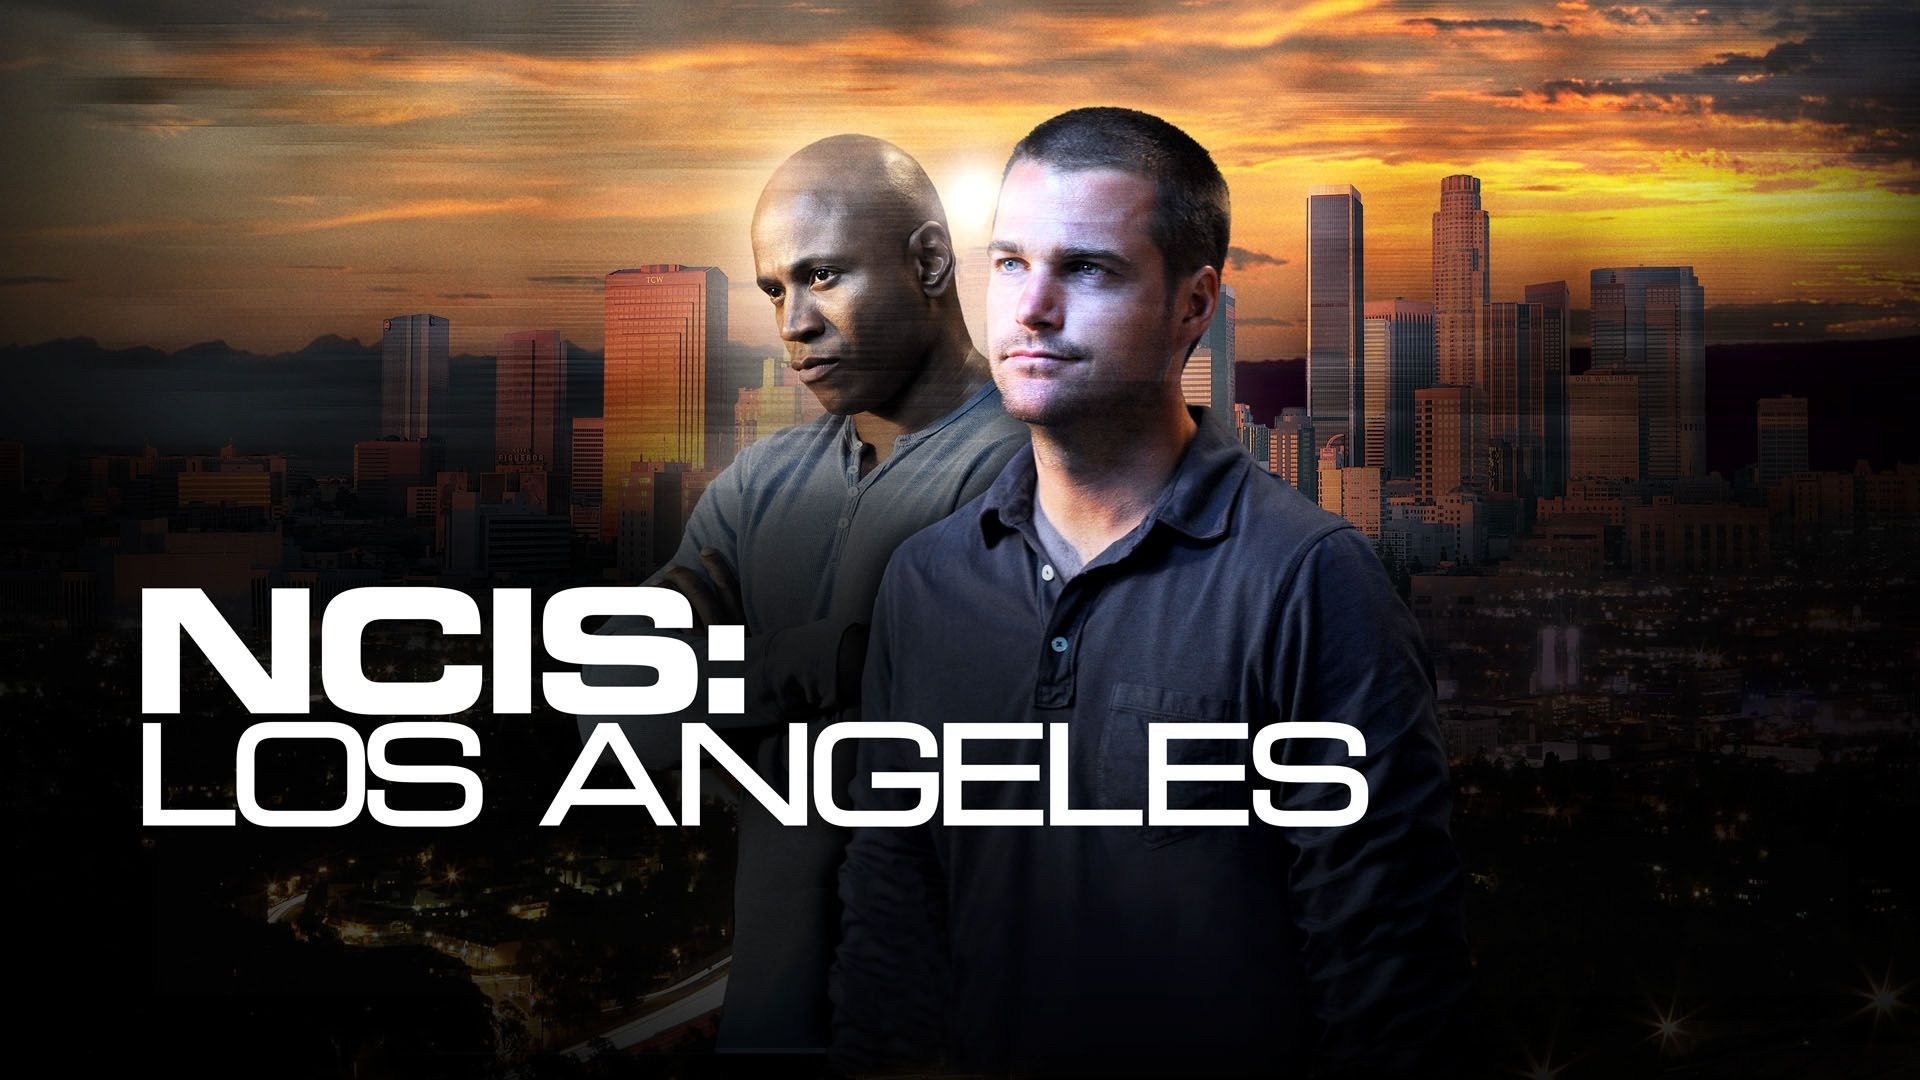 Ncis La: 69 Best Free NCIS Los Angeles Wallpapers